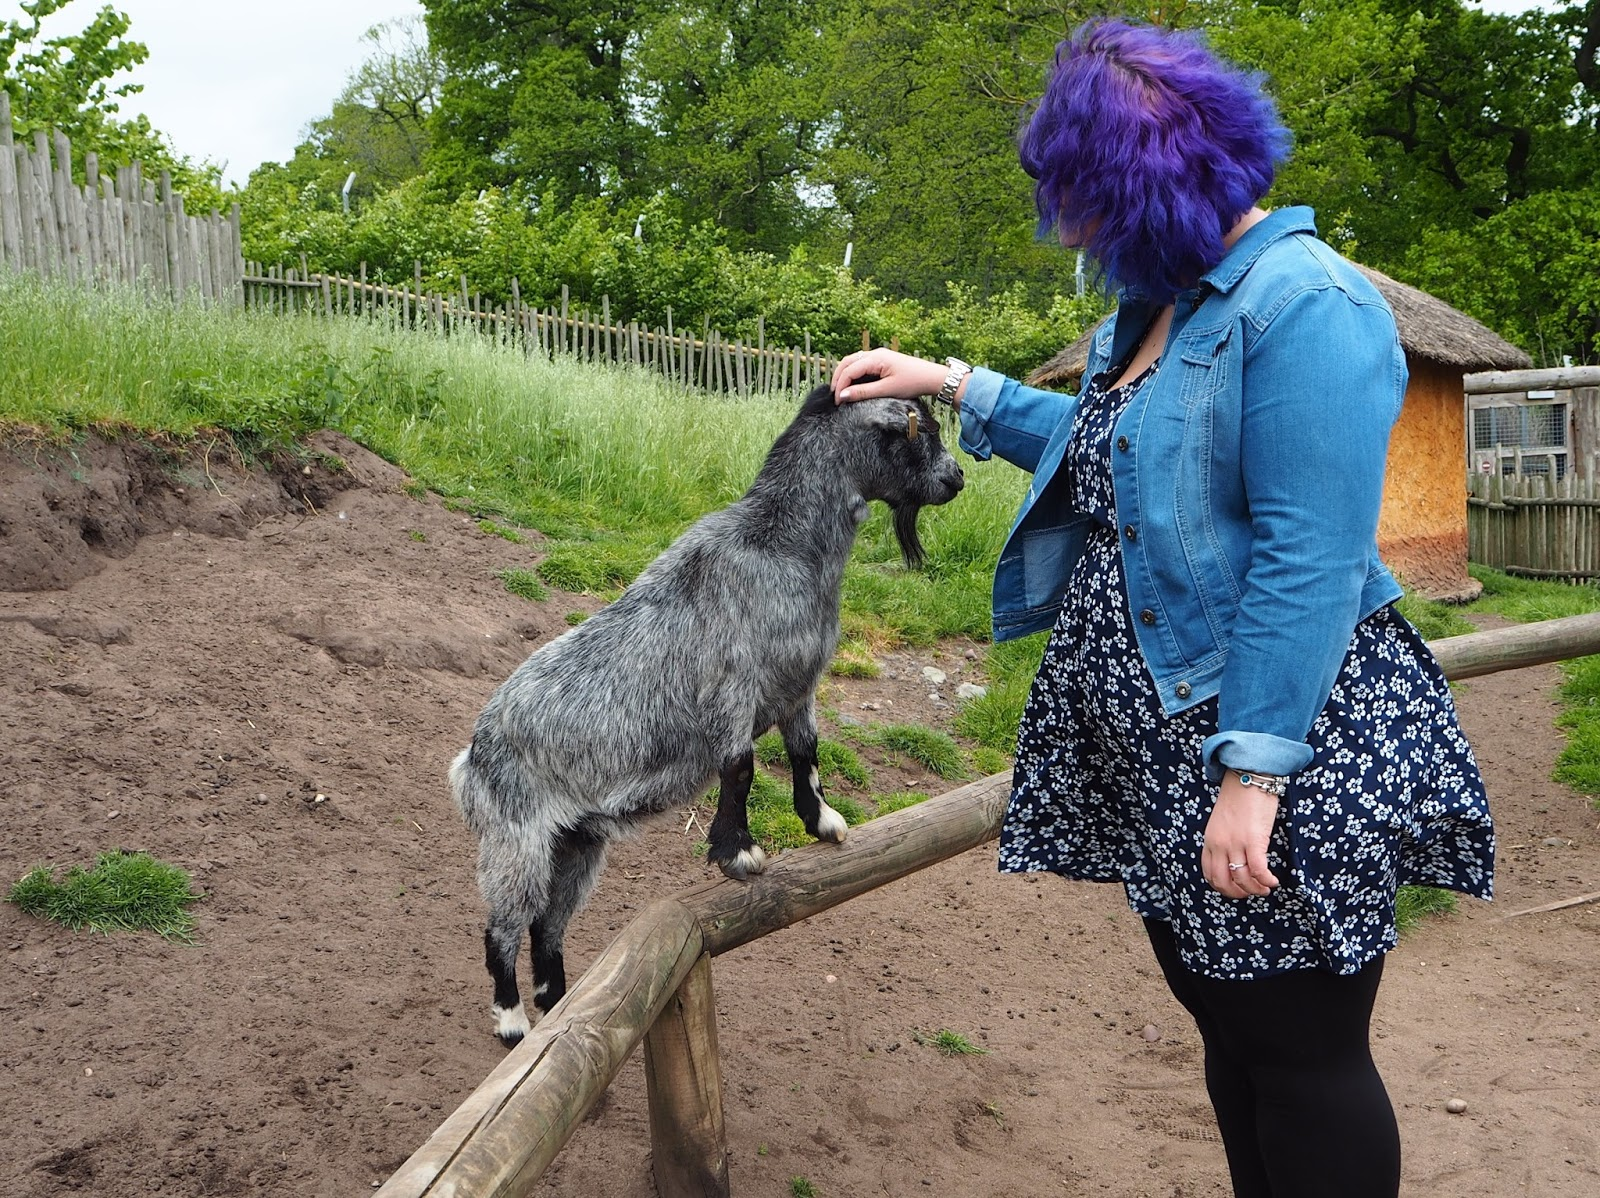 west midland safari park goat